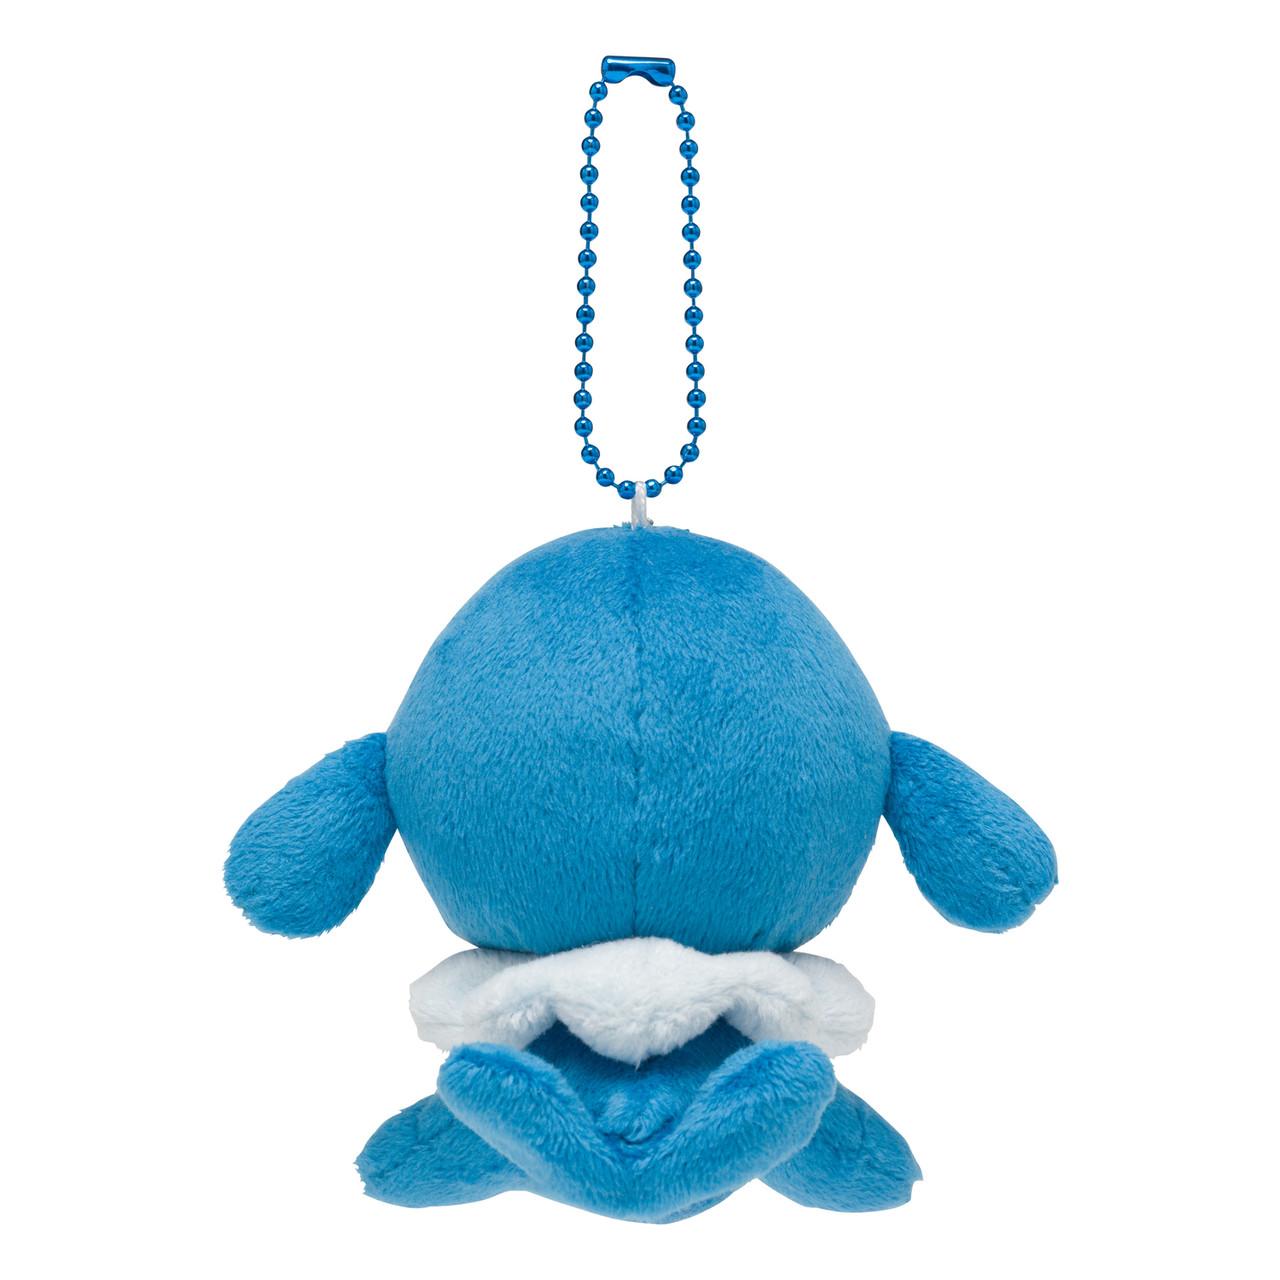 215303 Ashimari Pokemon Center Original Plush Doll Mocchiri Mascot Popplio